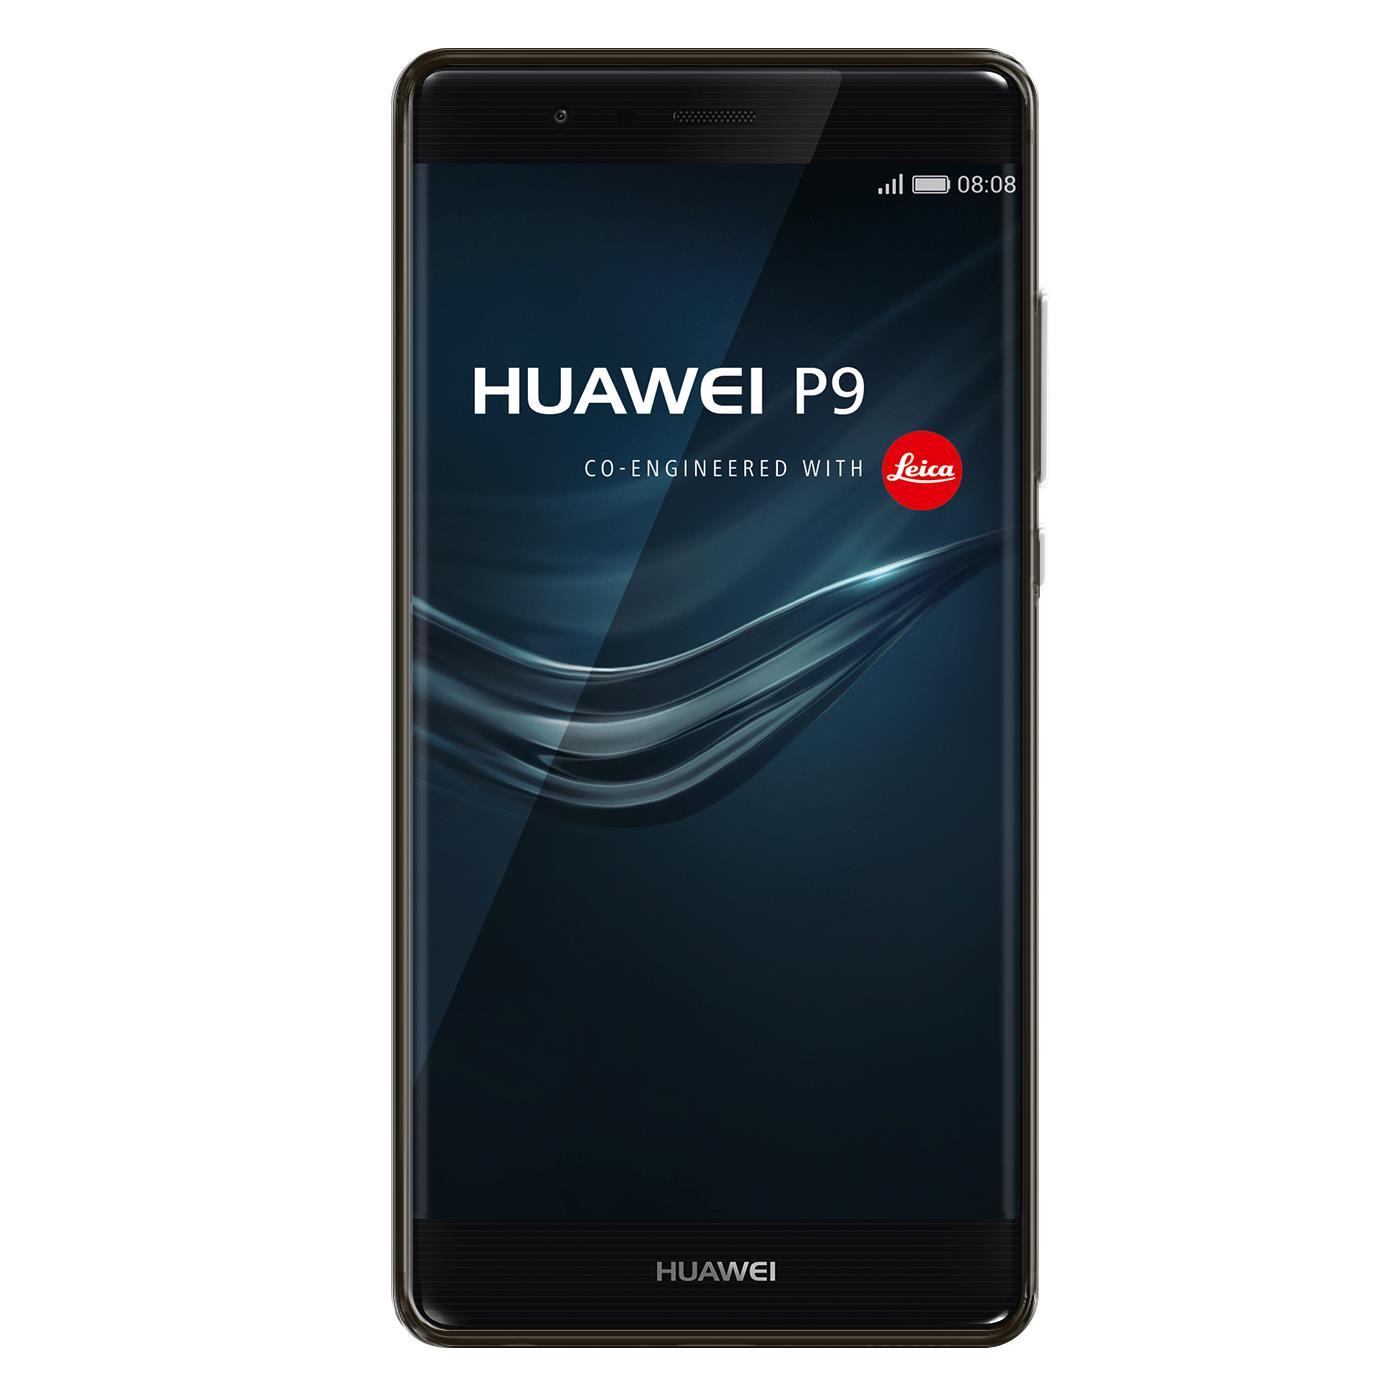 Huawei-p9-Duenn-Silikon-Klar-Case-Cover-Ultra-Slim-Stossfeste-Gel-Rueckseite Indexbild 29